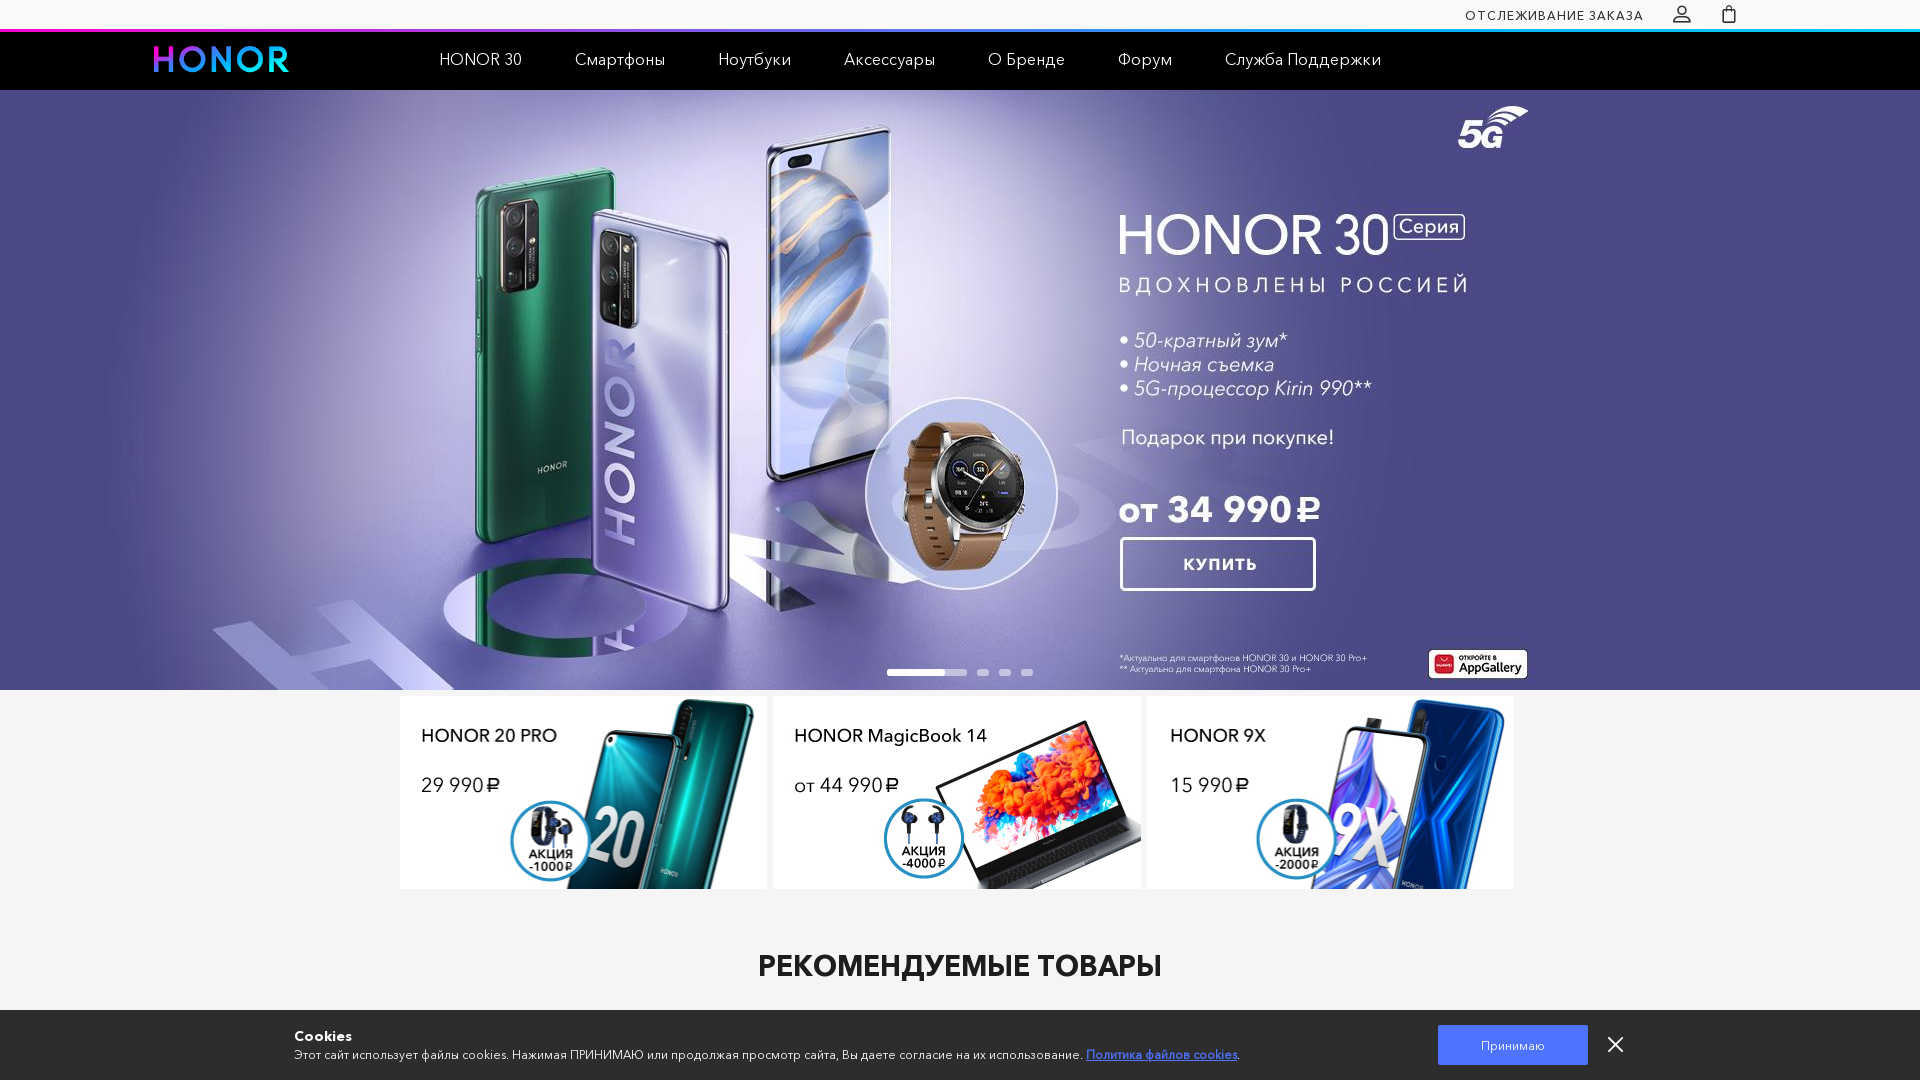 Honor website